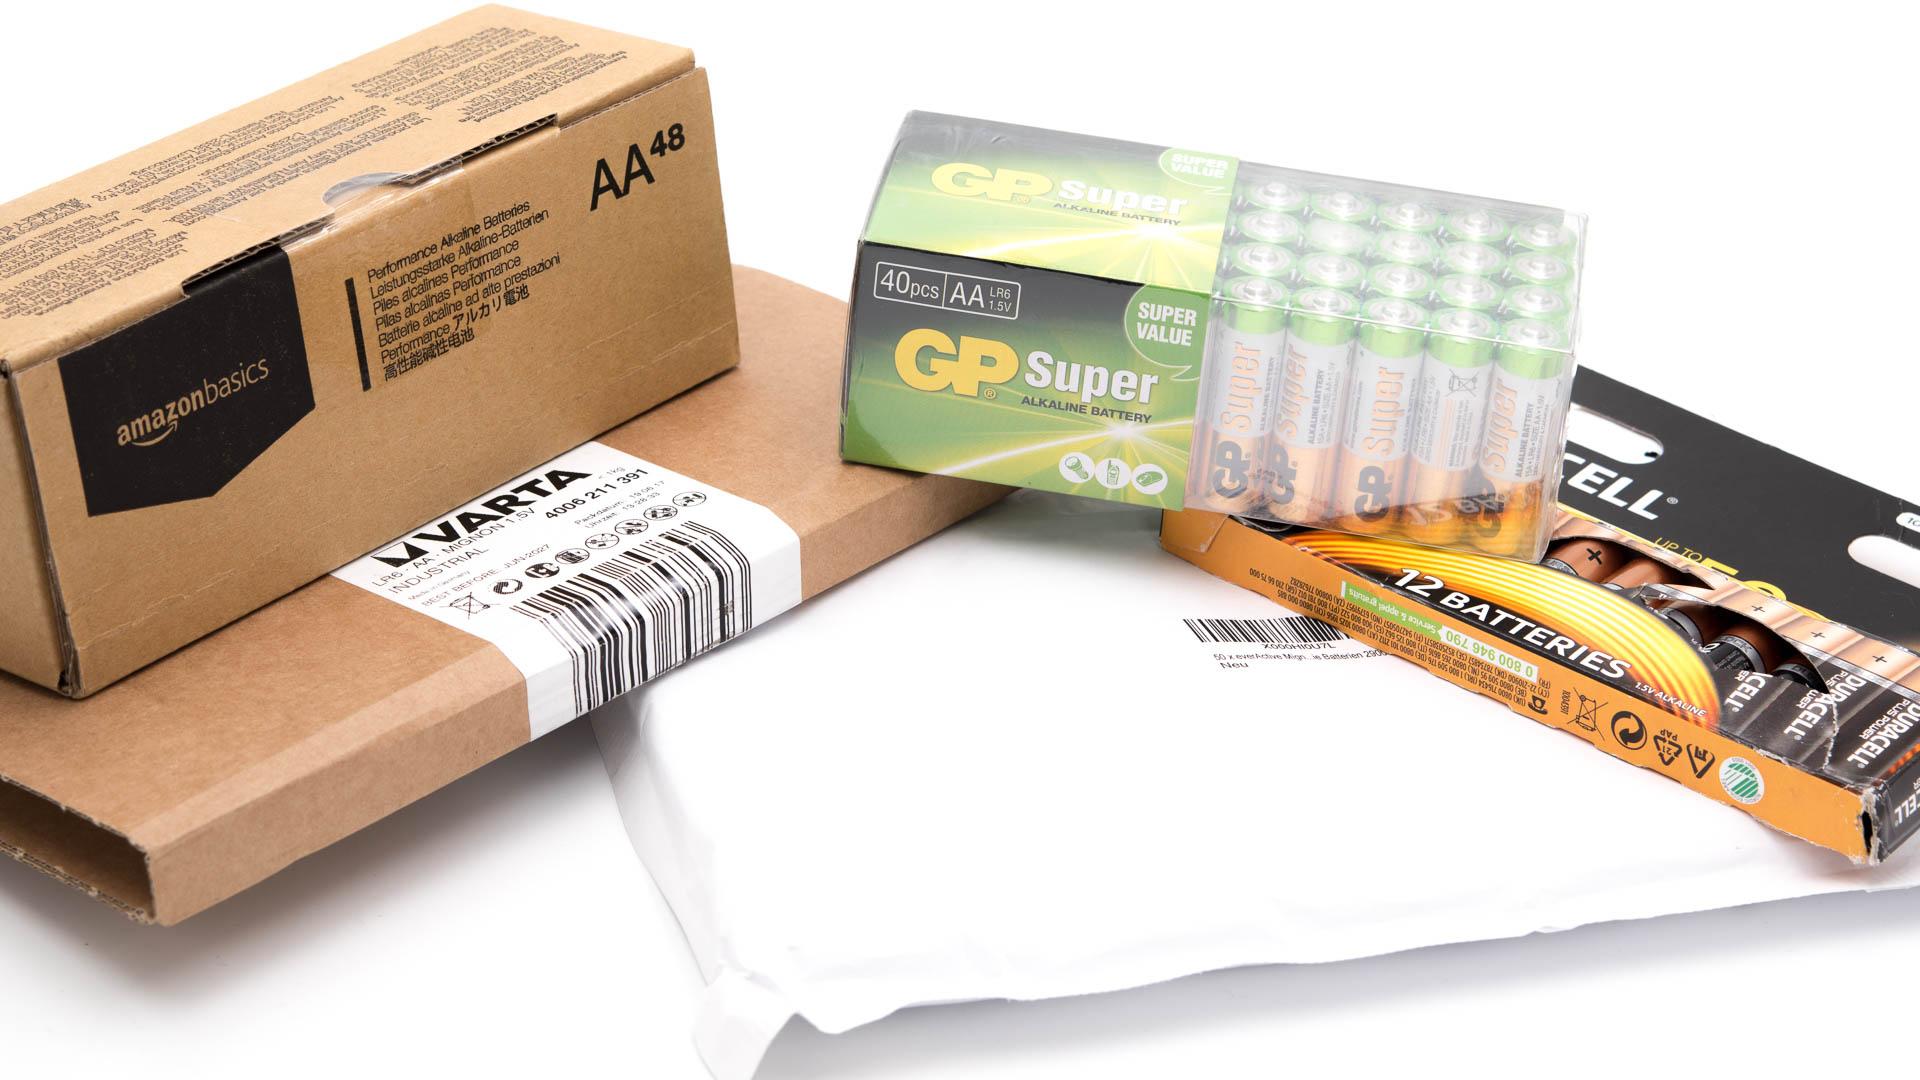 5x aa batterien gro packs im vergleich amazonbasics gp. Black Bedroom Furniture Sets. Home Design Ideas